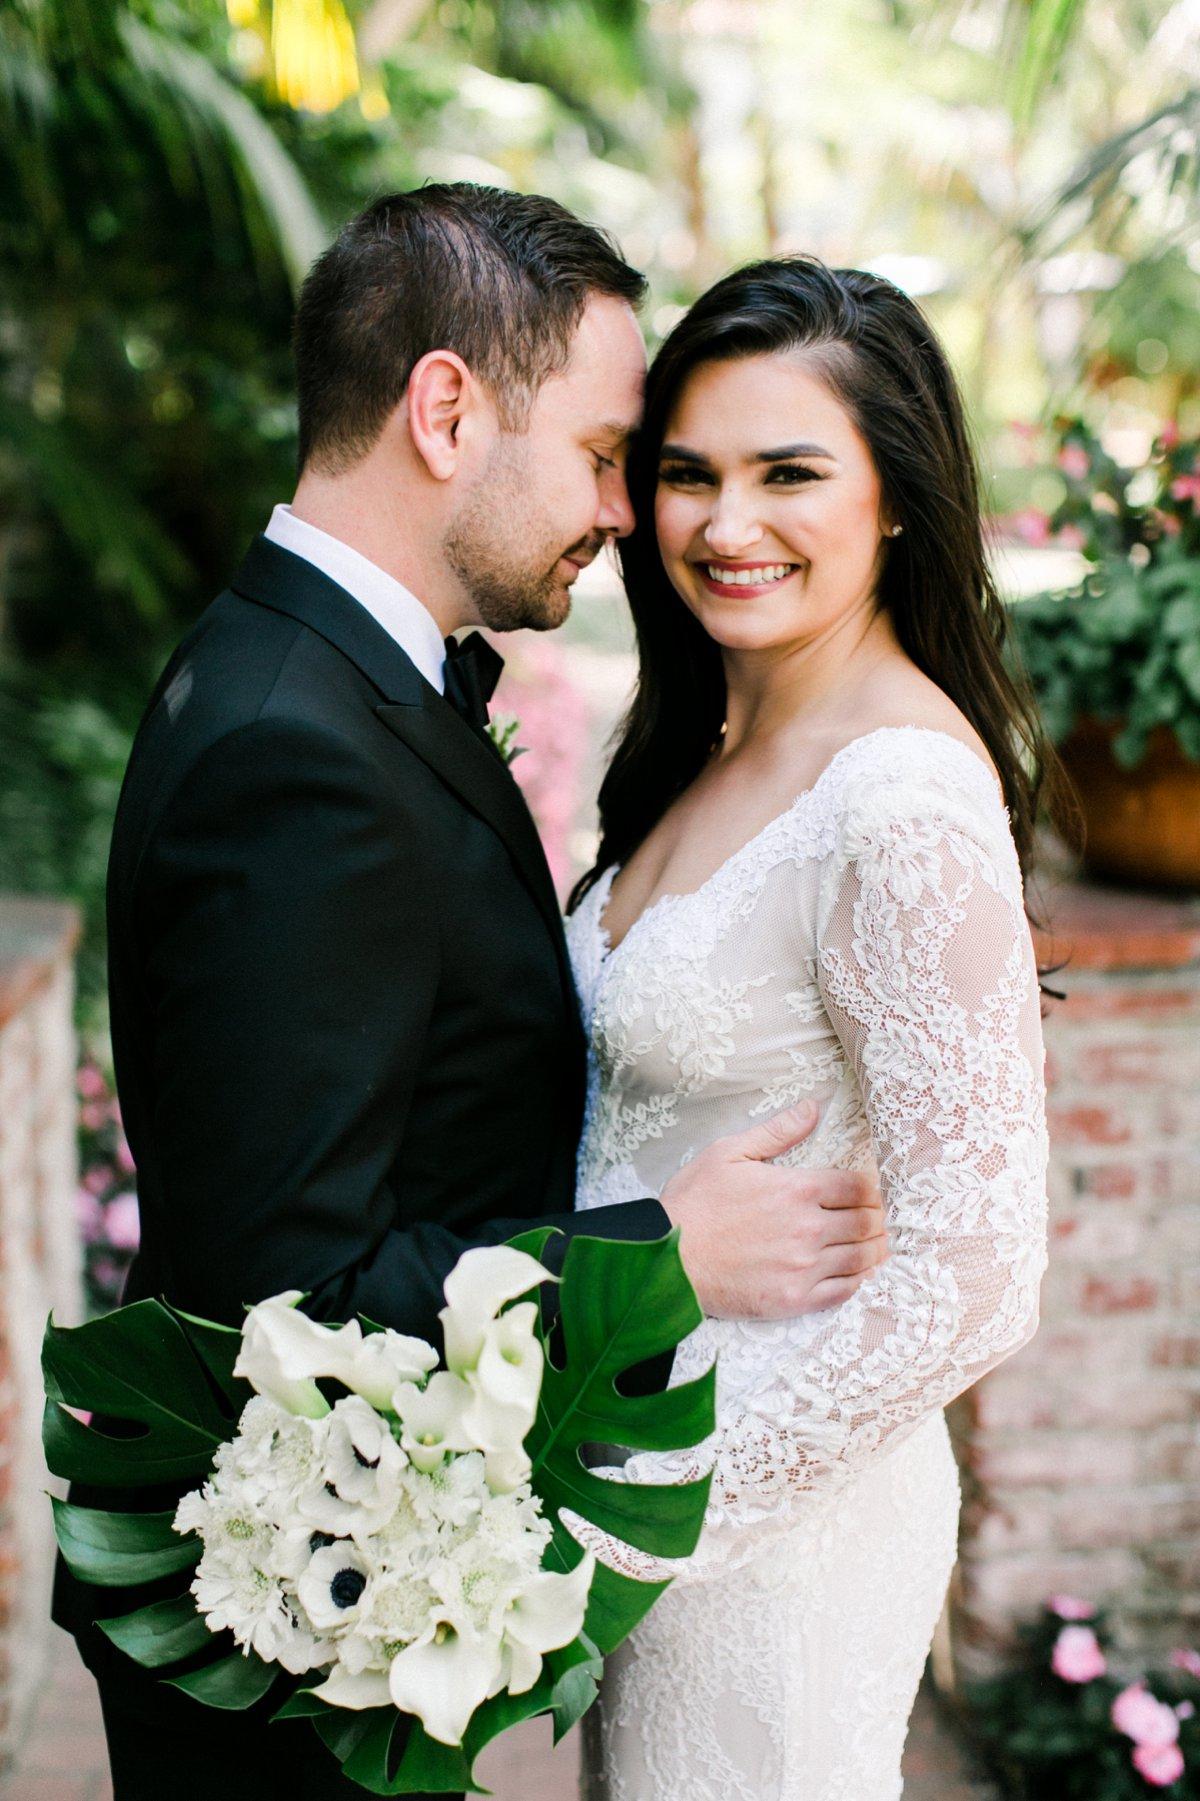 lace sleeve wedding dresses - photo by Anna Delores https://ruffledblog.com/chic-modern-wedding-at-four-seasons-santa-barbara